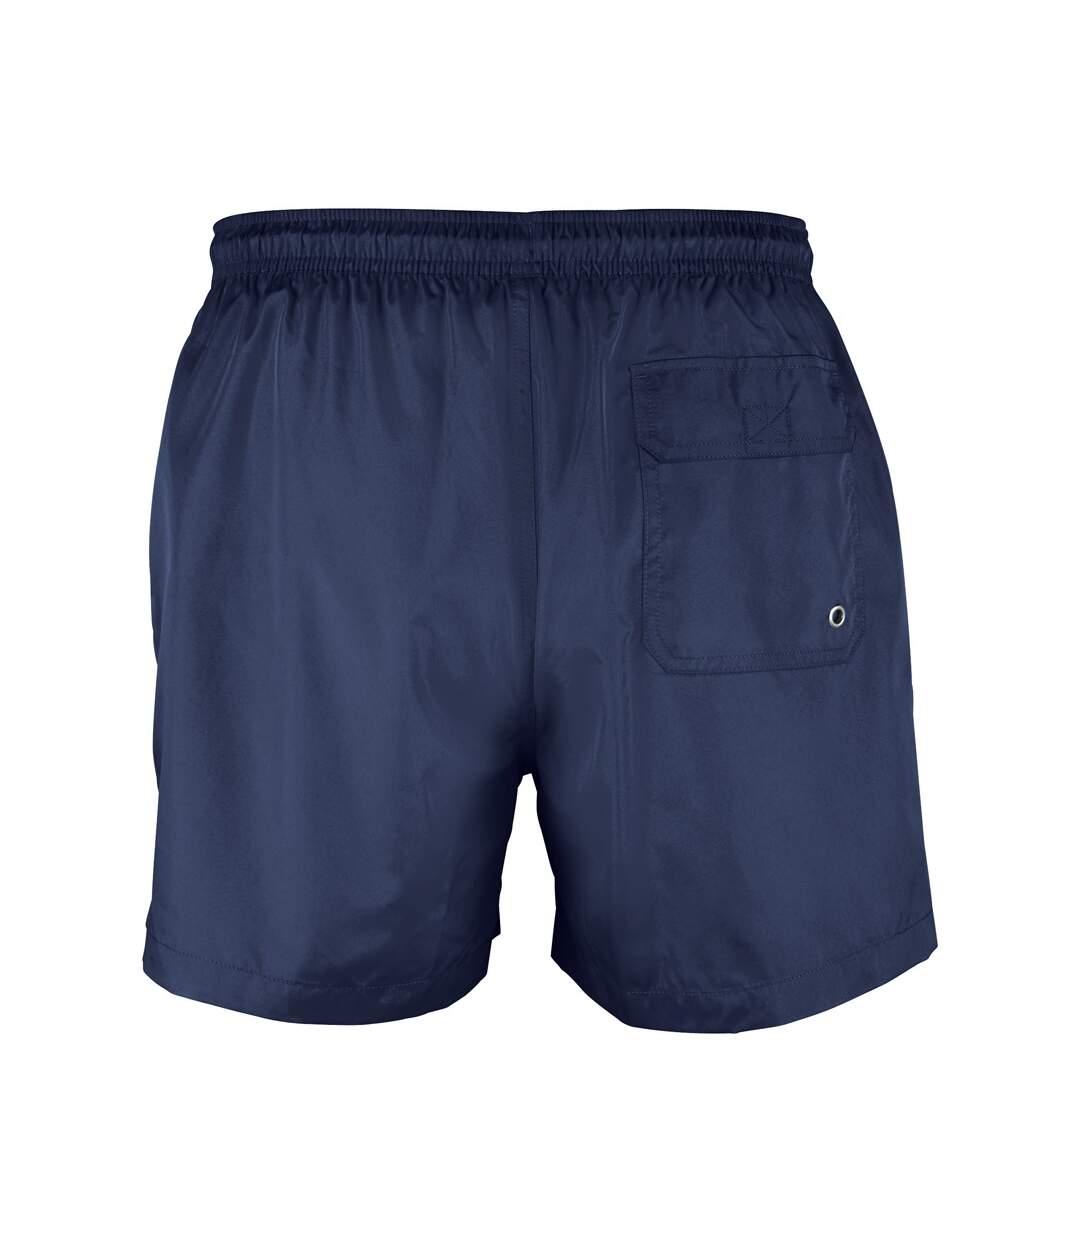 Dégagement Sols Short De Bain Sunrise Homme Bleu marine UTPC3643 dsf.d455nksdKLFHG